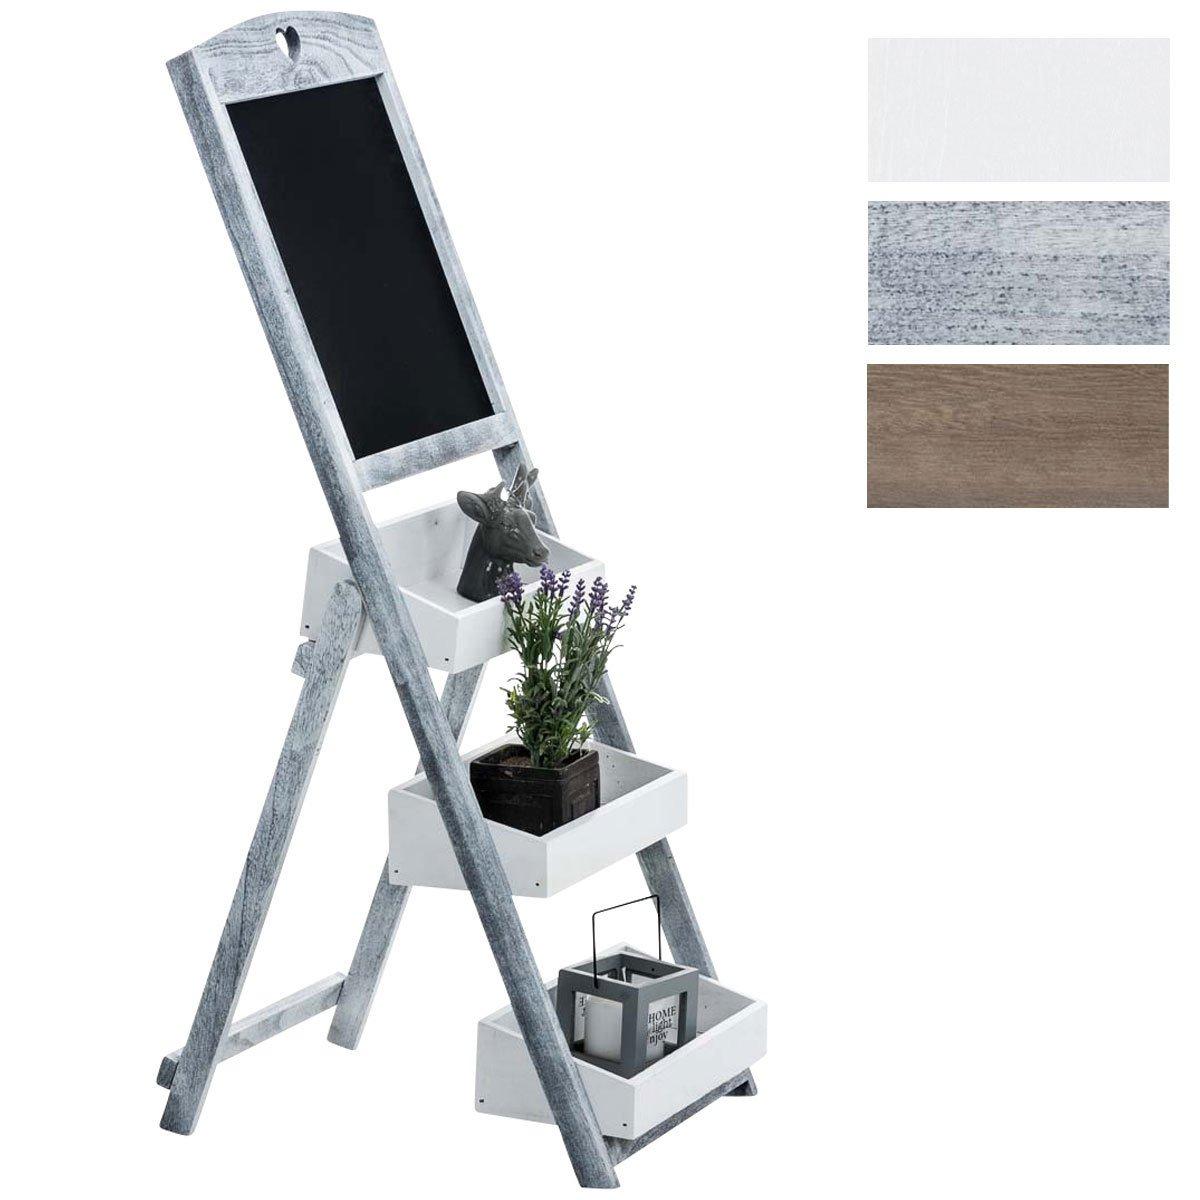 CLP ladder shelf HARALD with board, flower rack, 3 shelf boxes, foldable dark brown